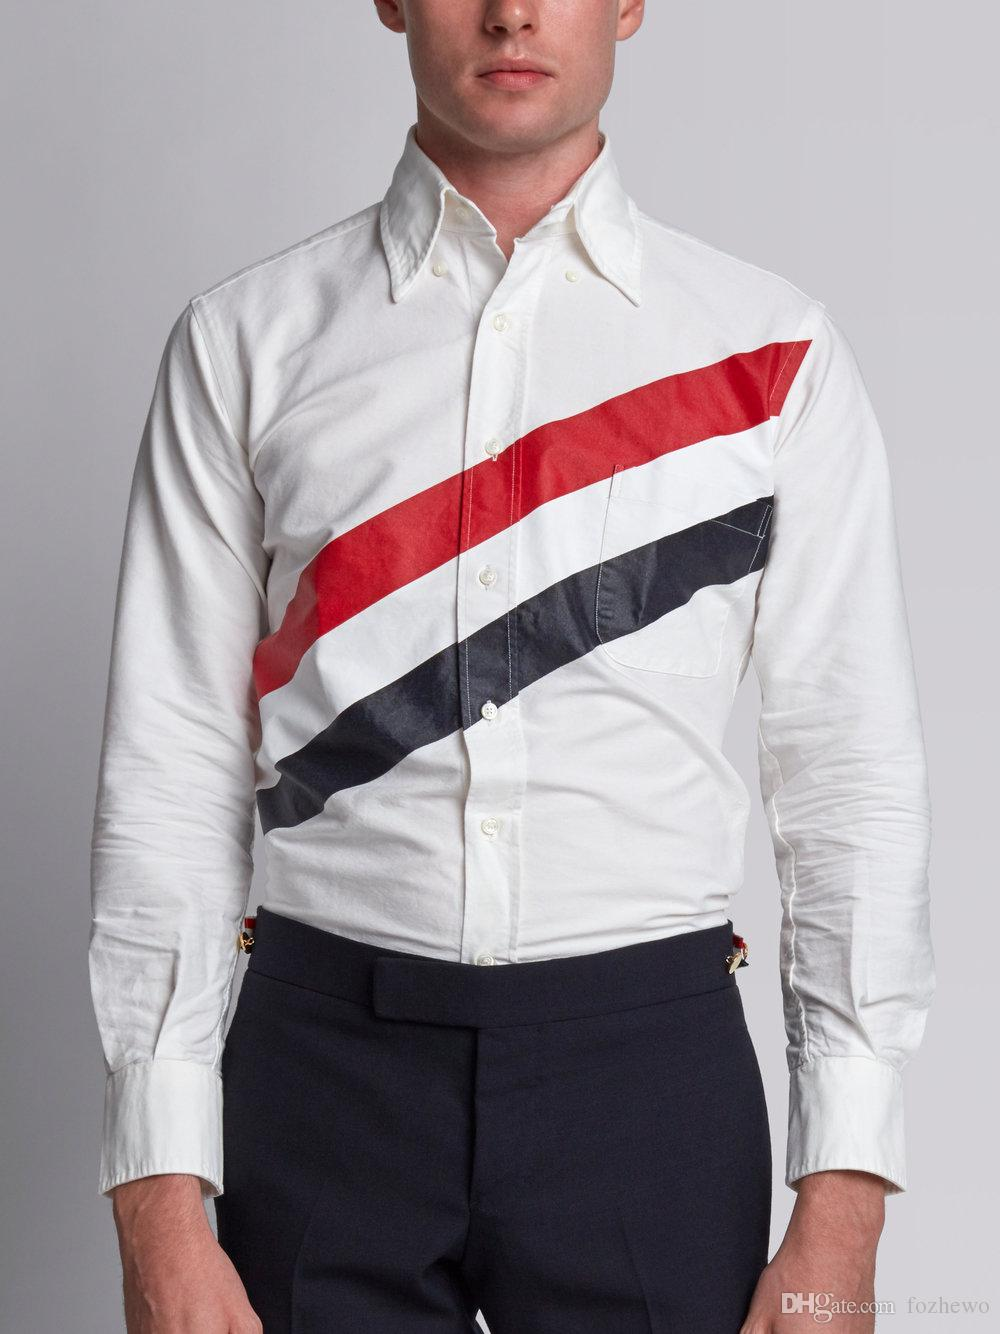 025363ded0 2017 New Arrive Autumn Long Sleeve Shirts Men Slim Casual Cotton ...